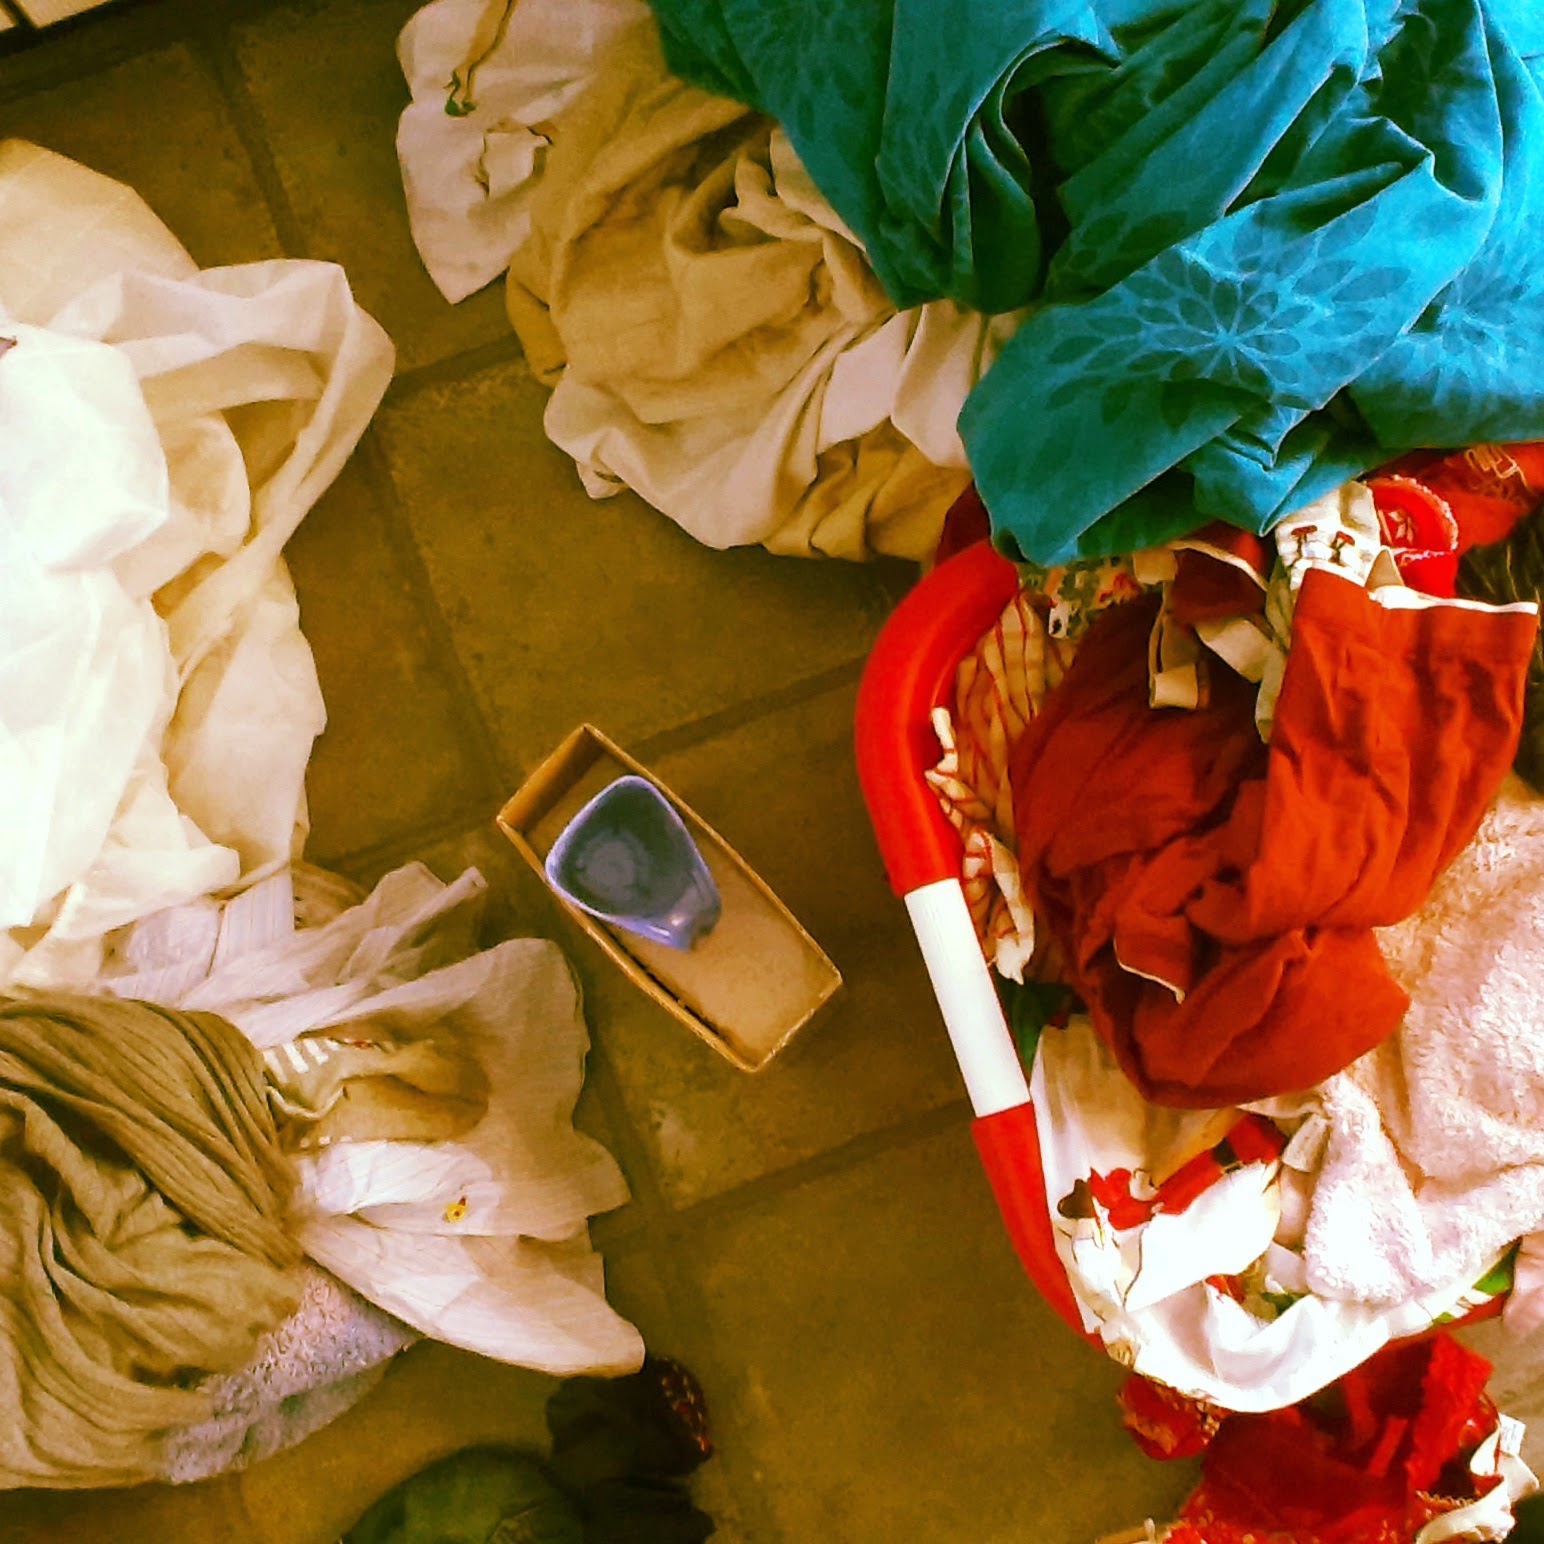 3pm - doing the washing